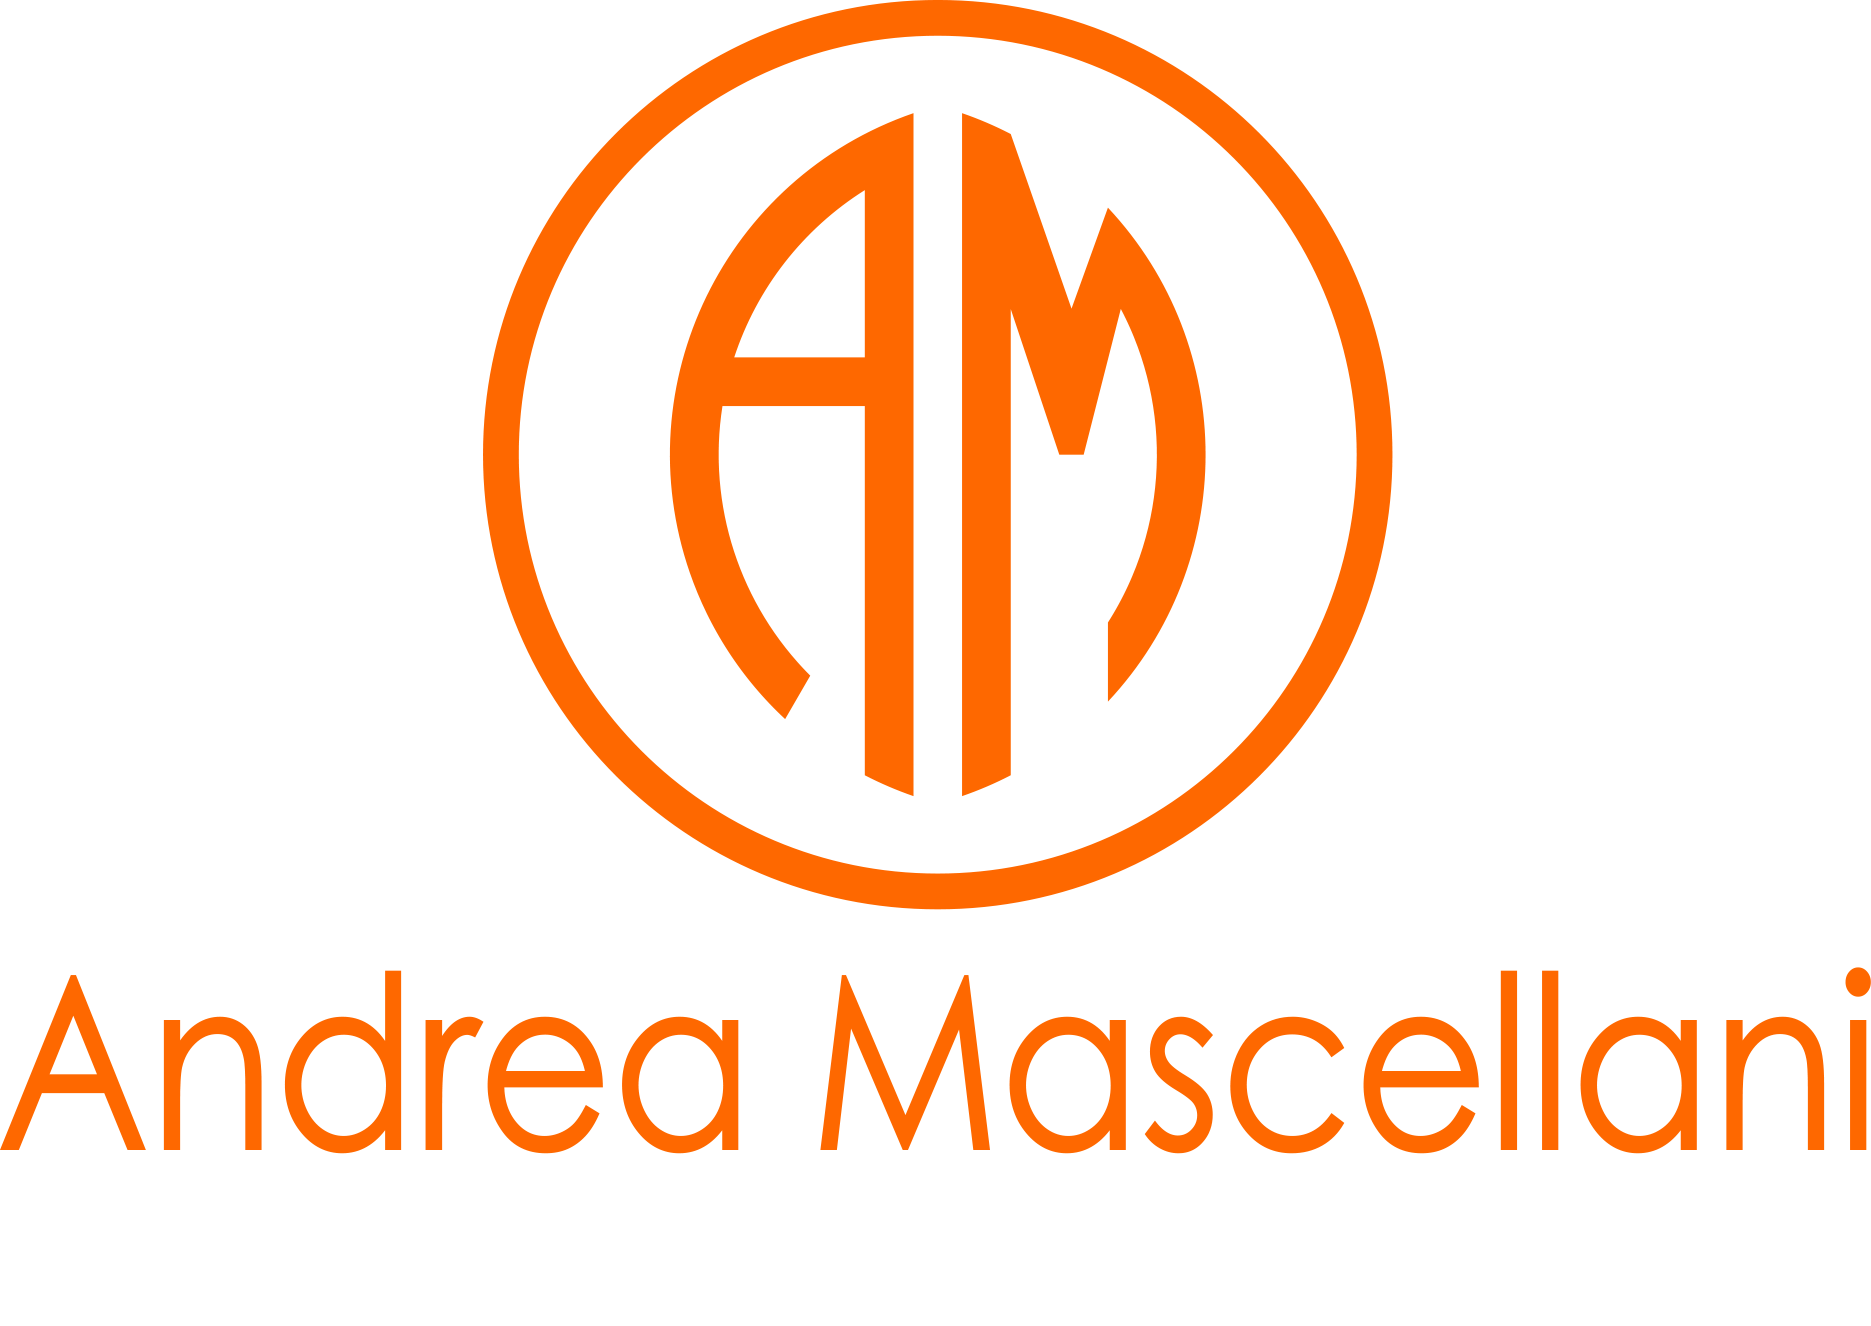 Andrea Mascellani